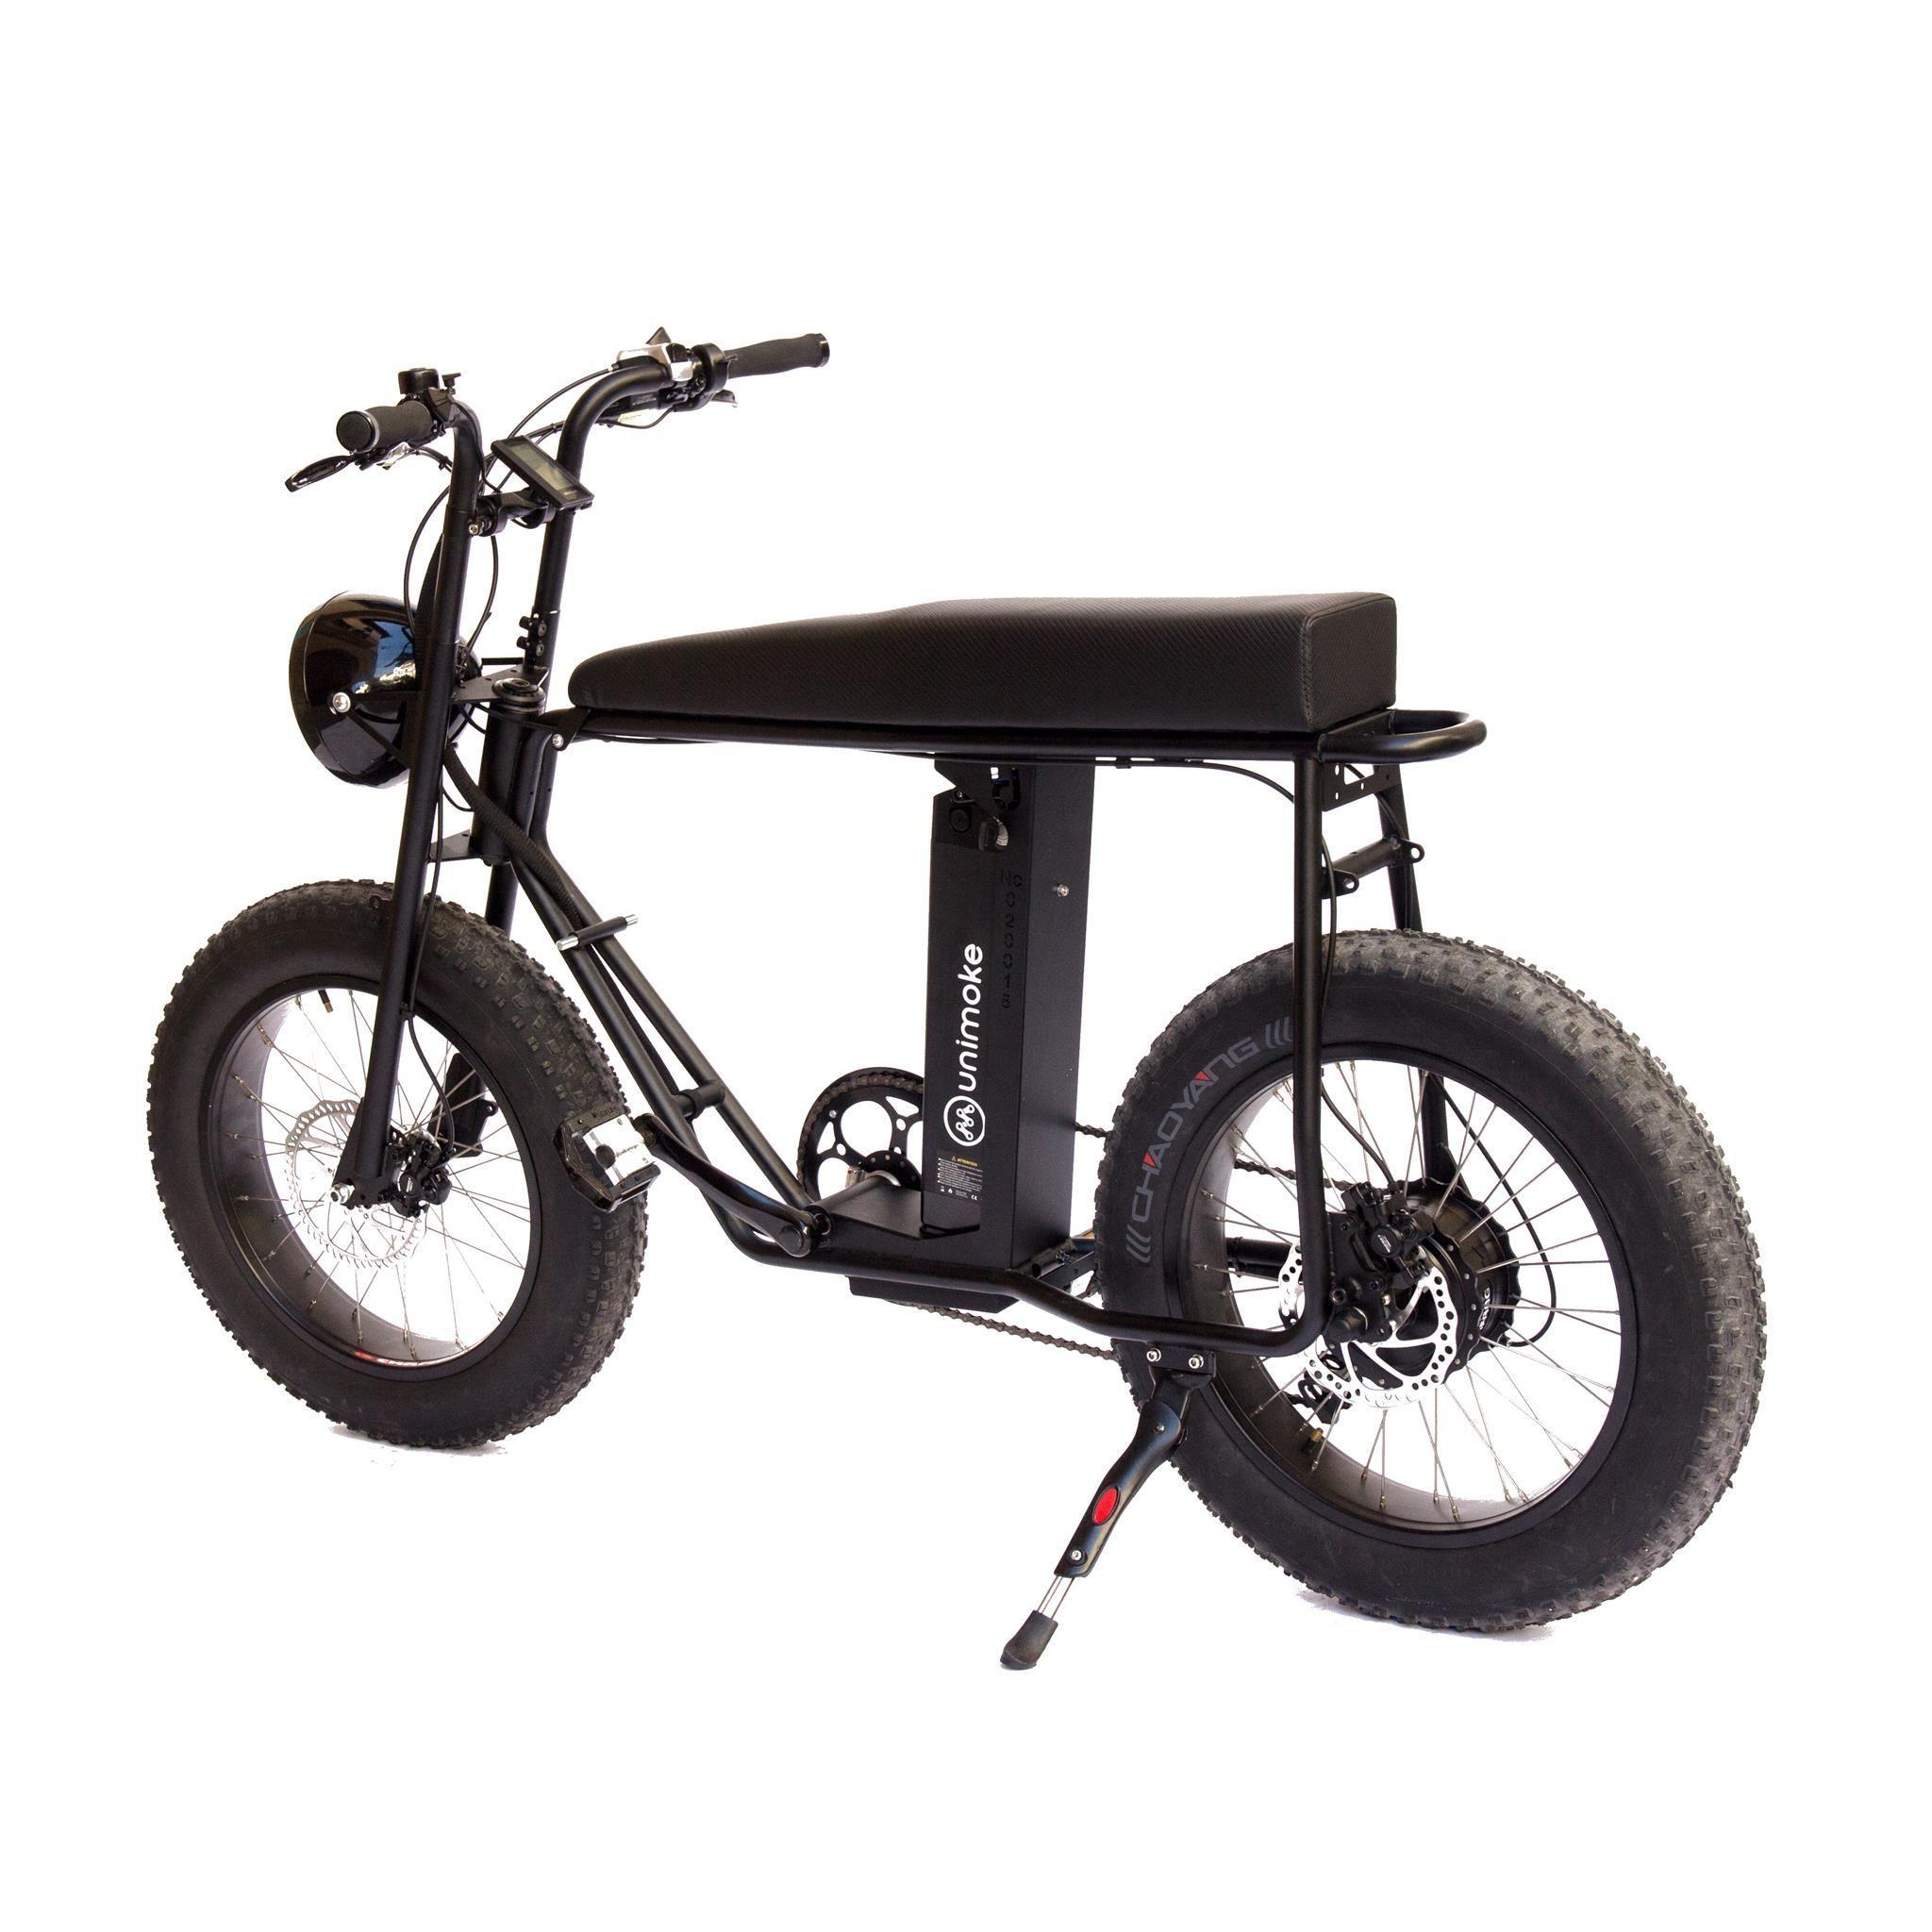 Uni Moke Classic Electric Bike Uni Moke Classic Electric